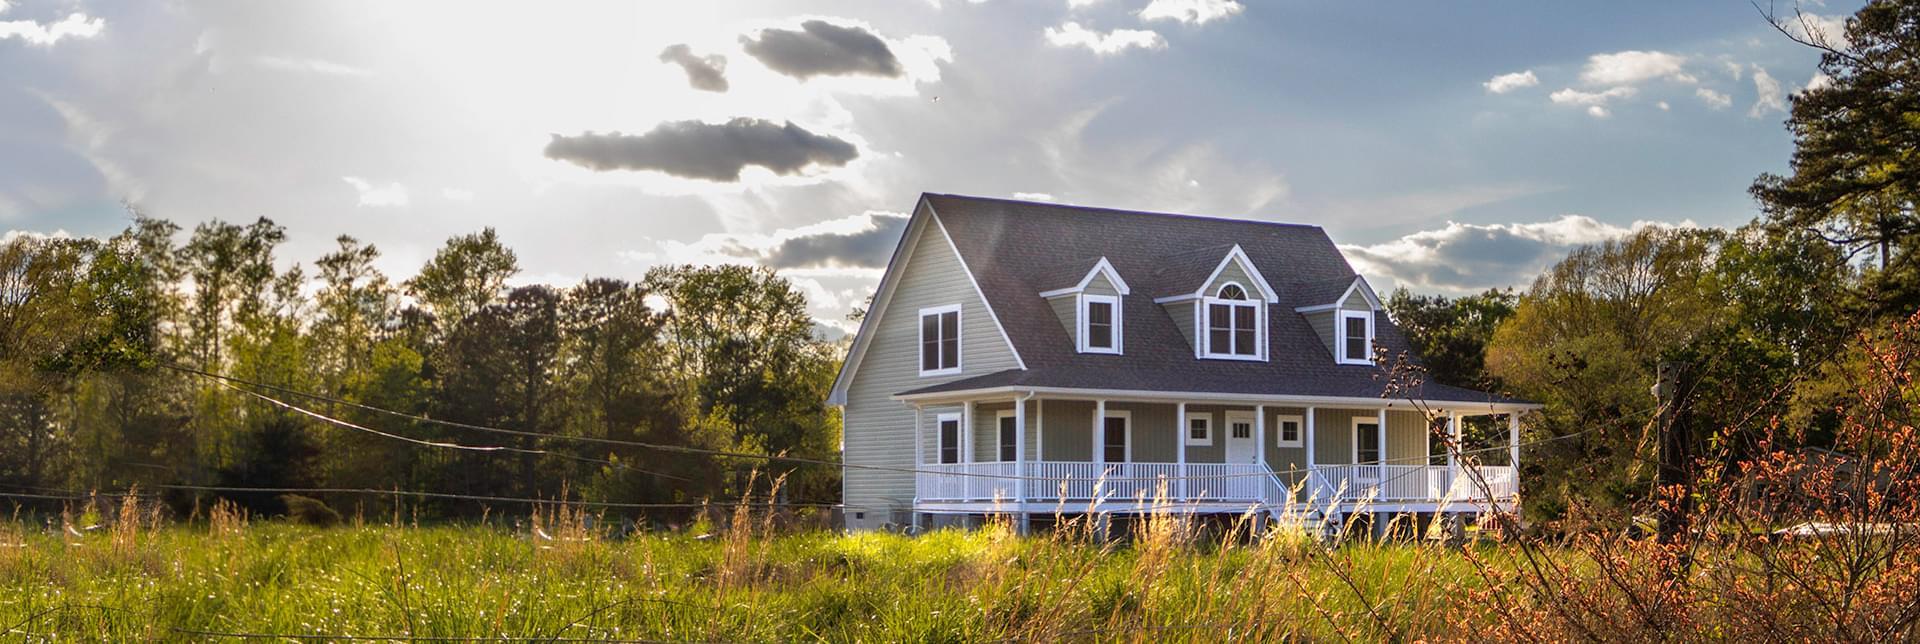 New Homes in Richmond County VA